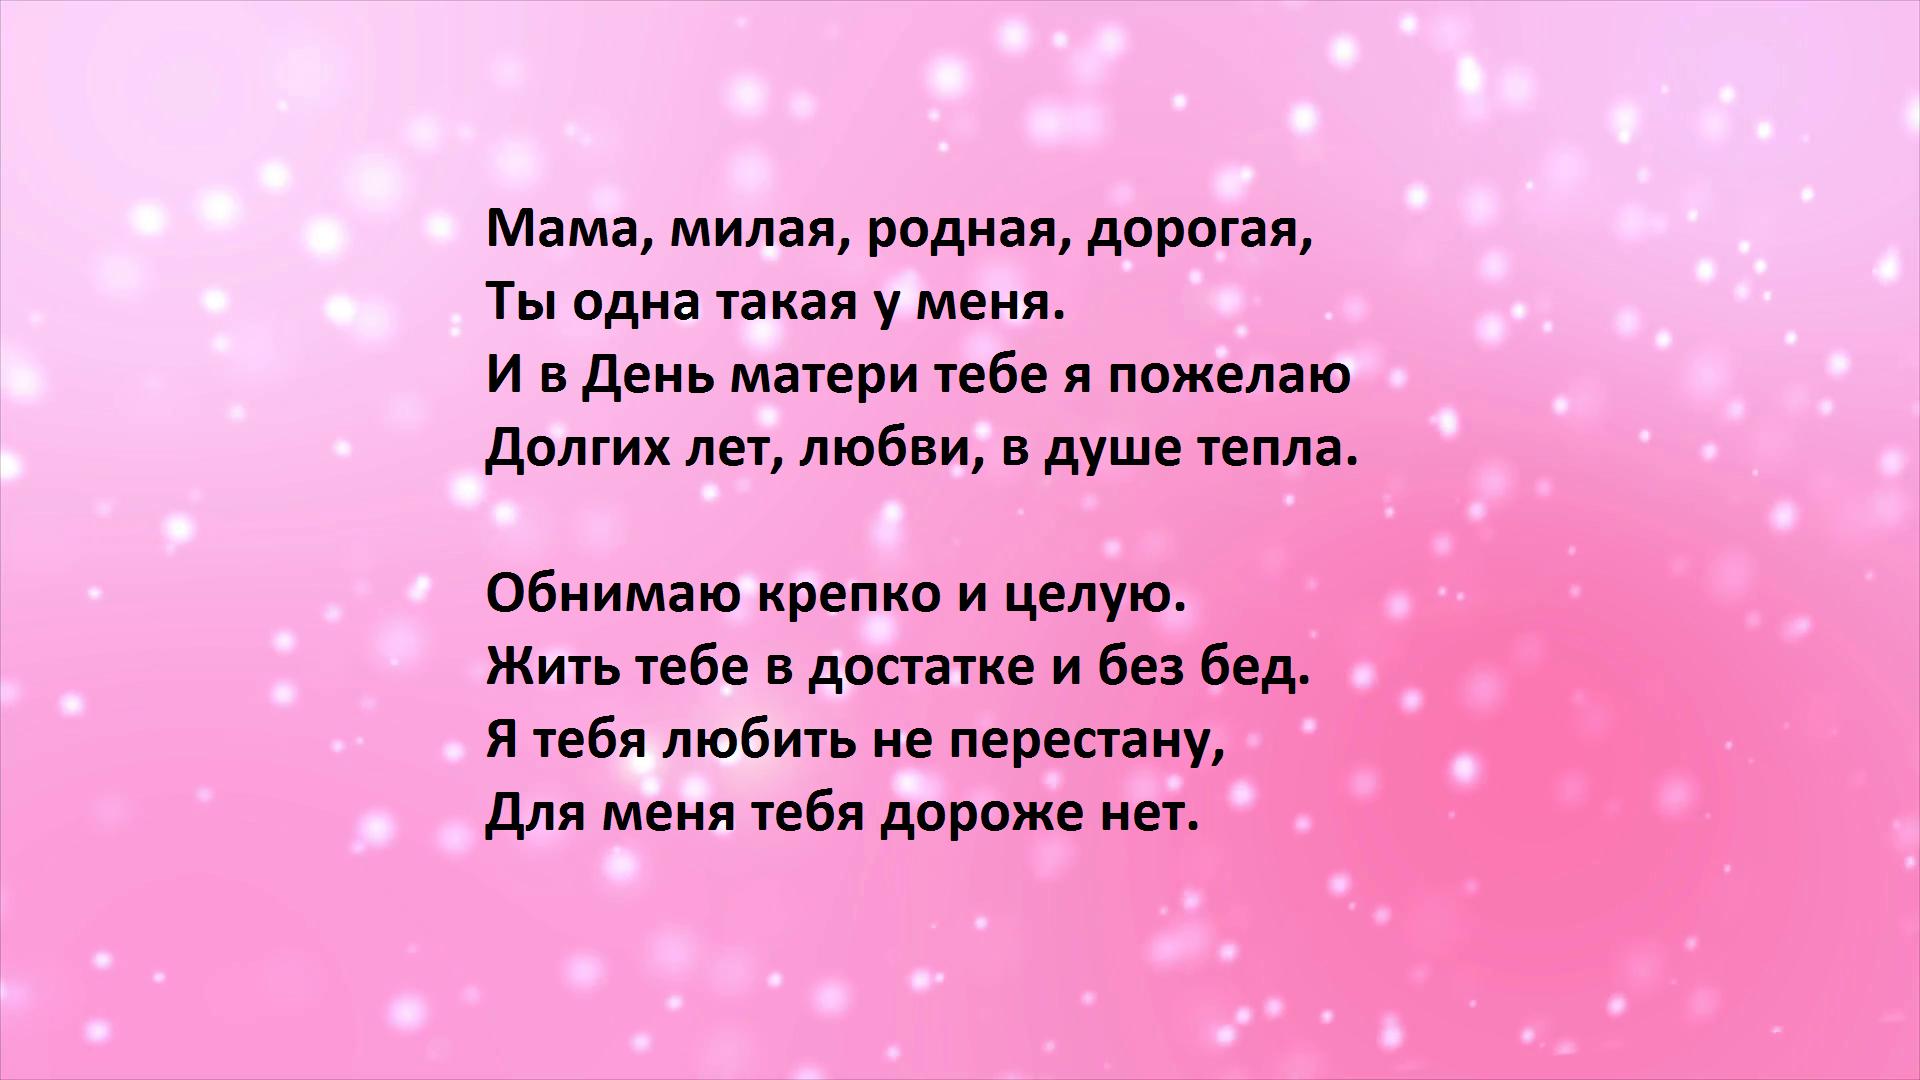 mame1